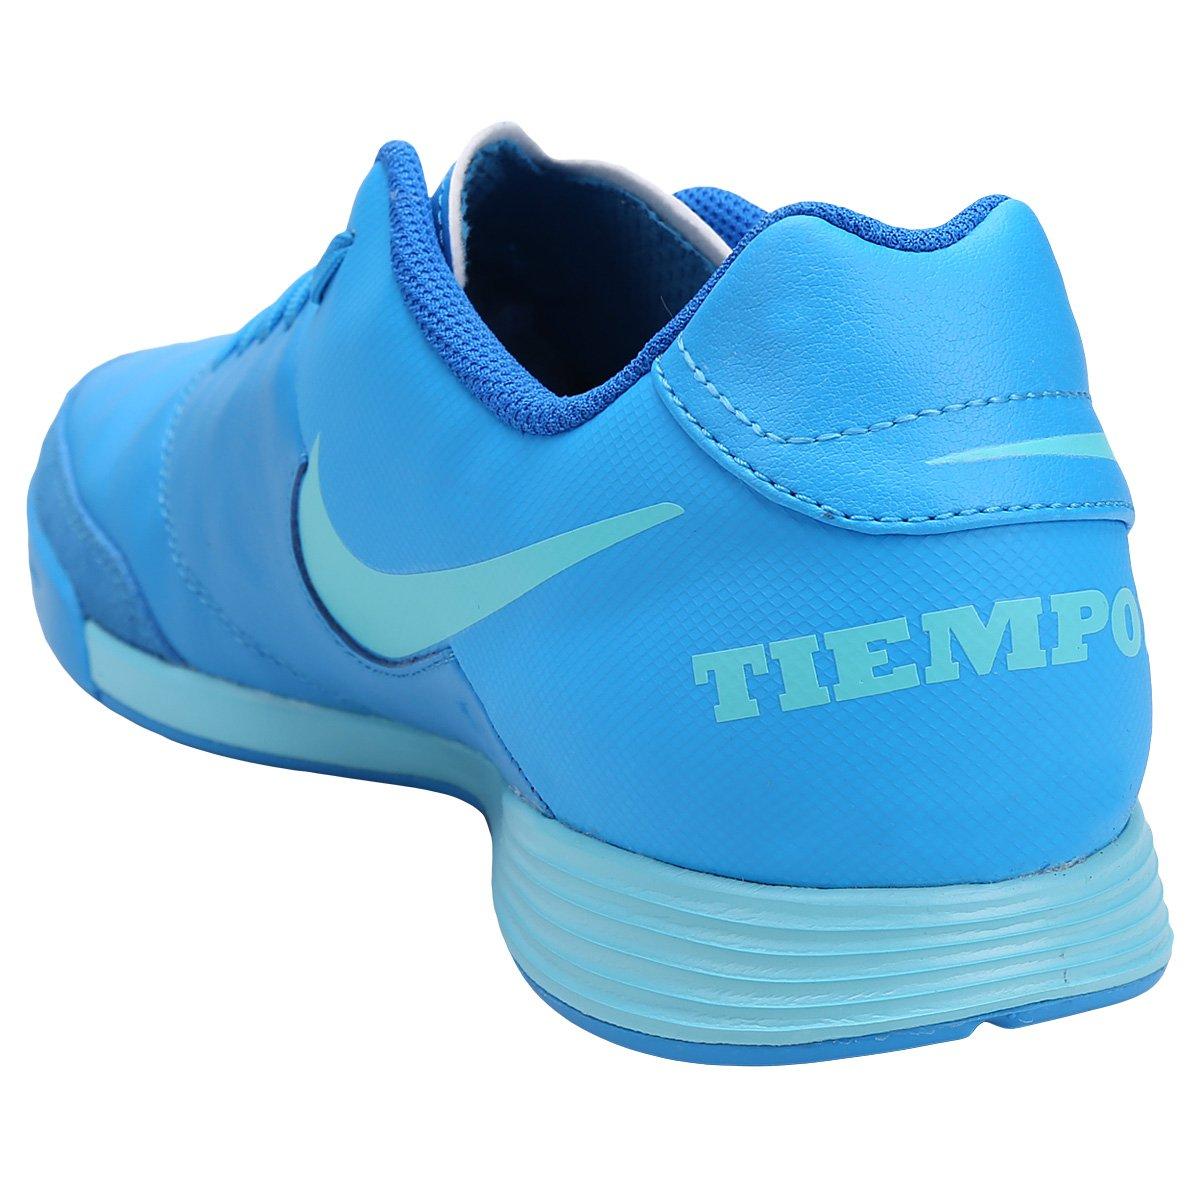 Chuteira Futsal Nike Tiempo Genio 2 Leather IC - Compre Agora  4d22d53c2a71a